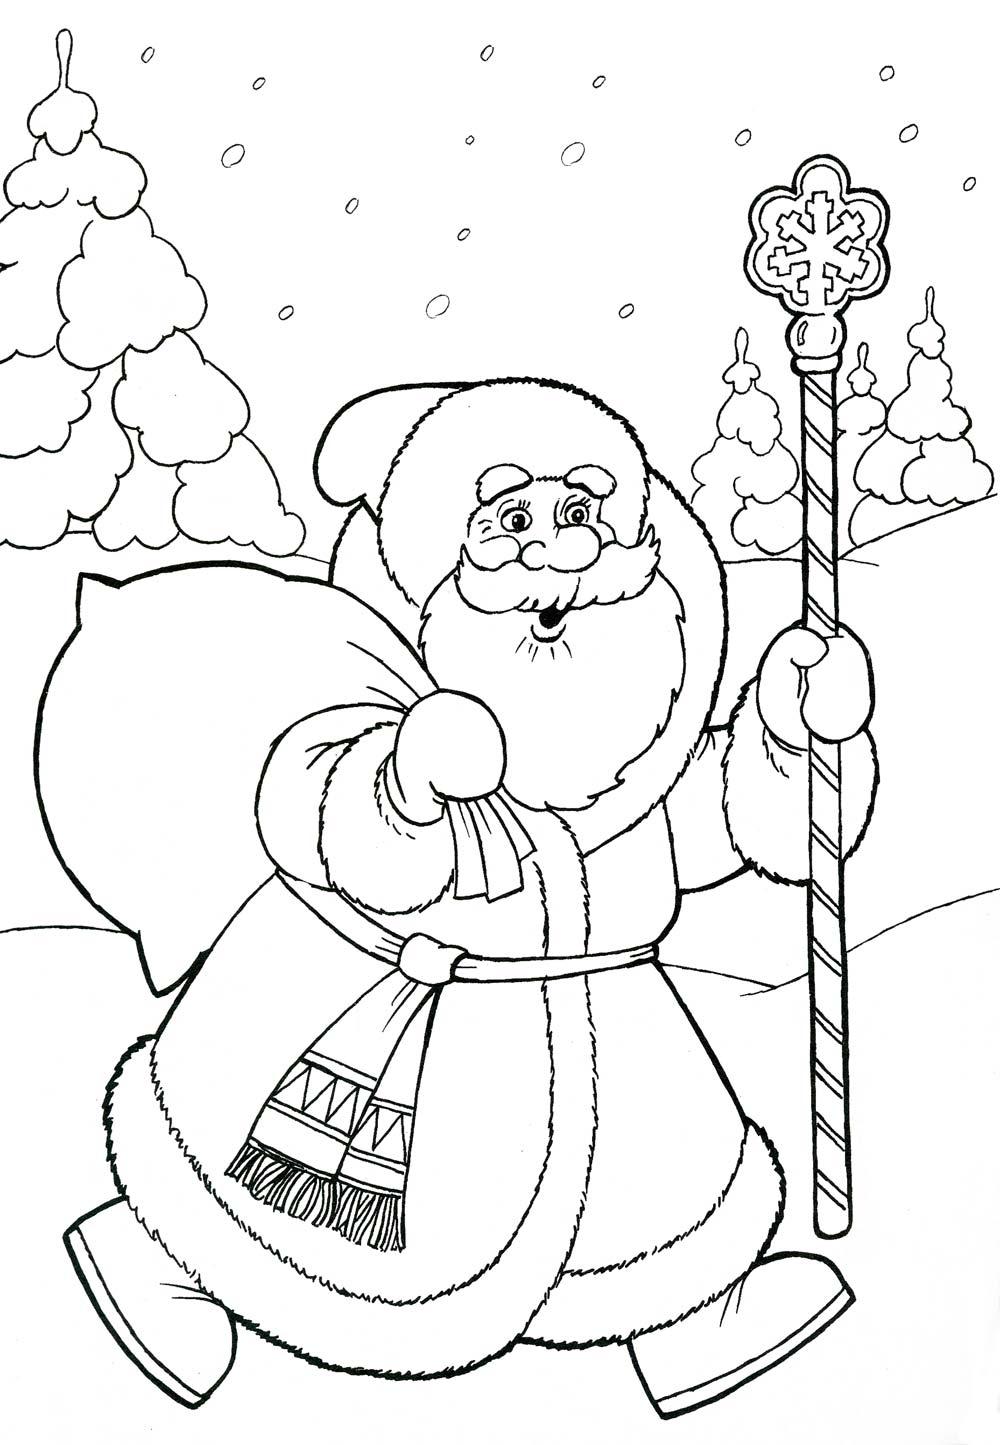 Раскраска. Дед Мороз